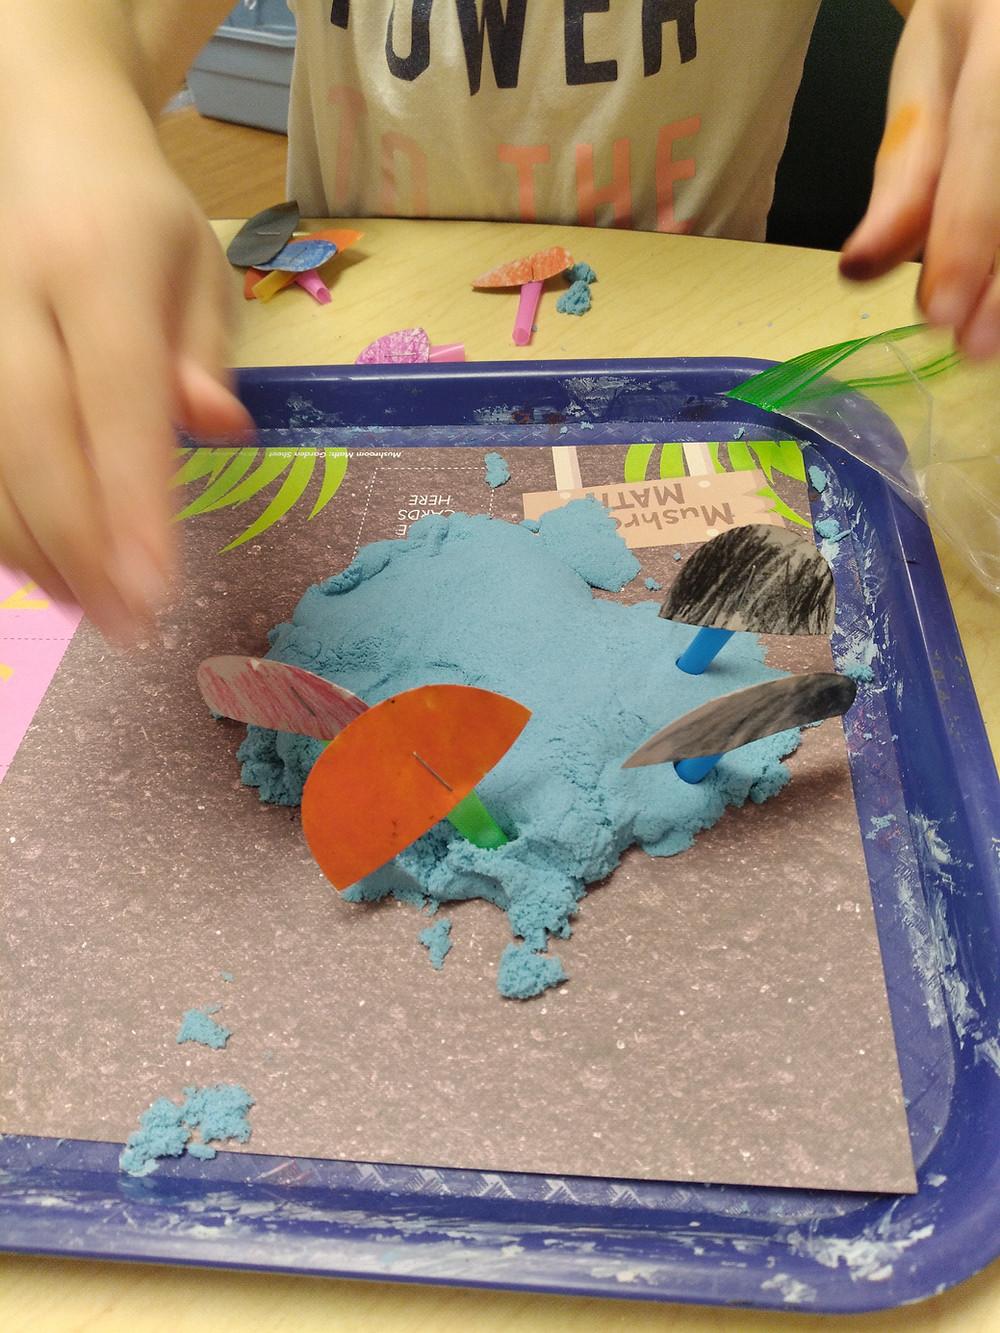 preschool math game using playdough and handmade mushrooms